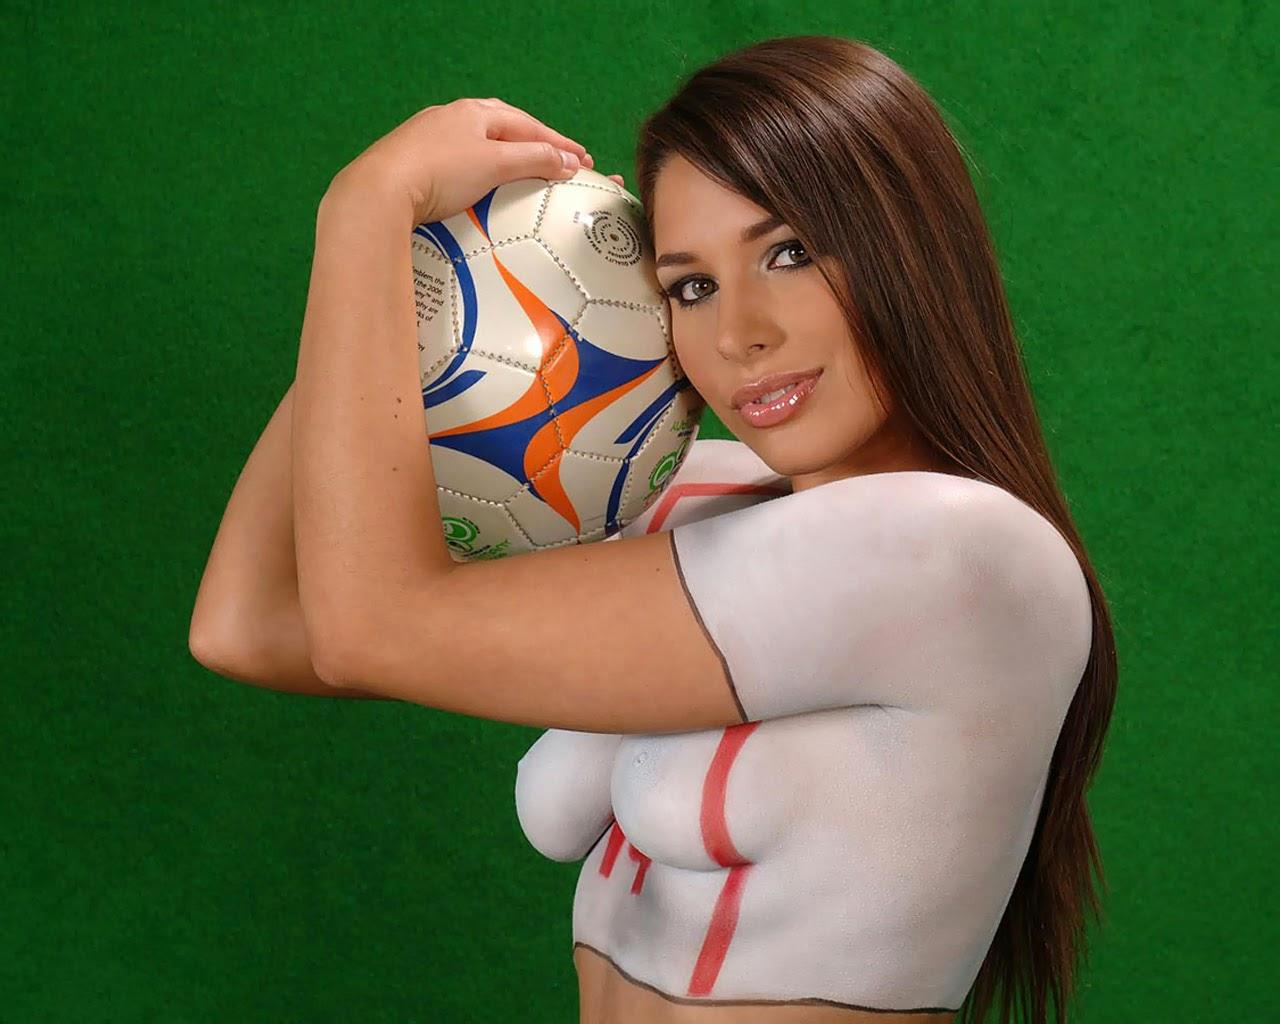 Brazilian football girl 2 10